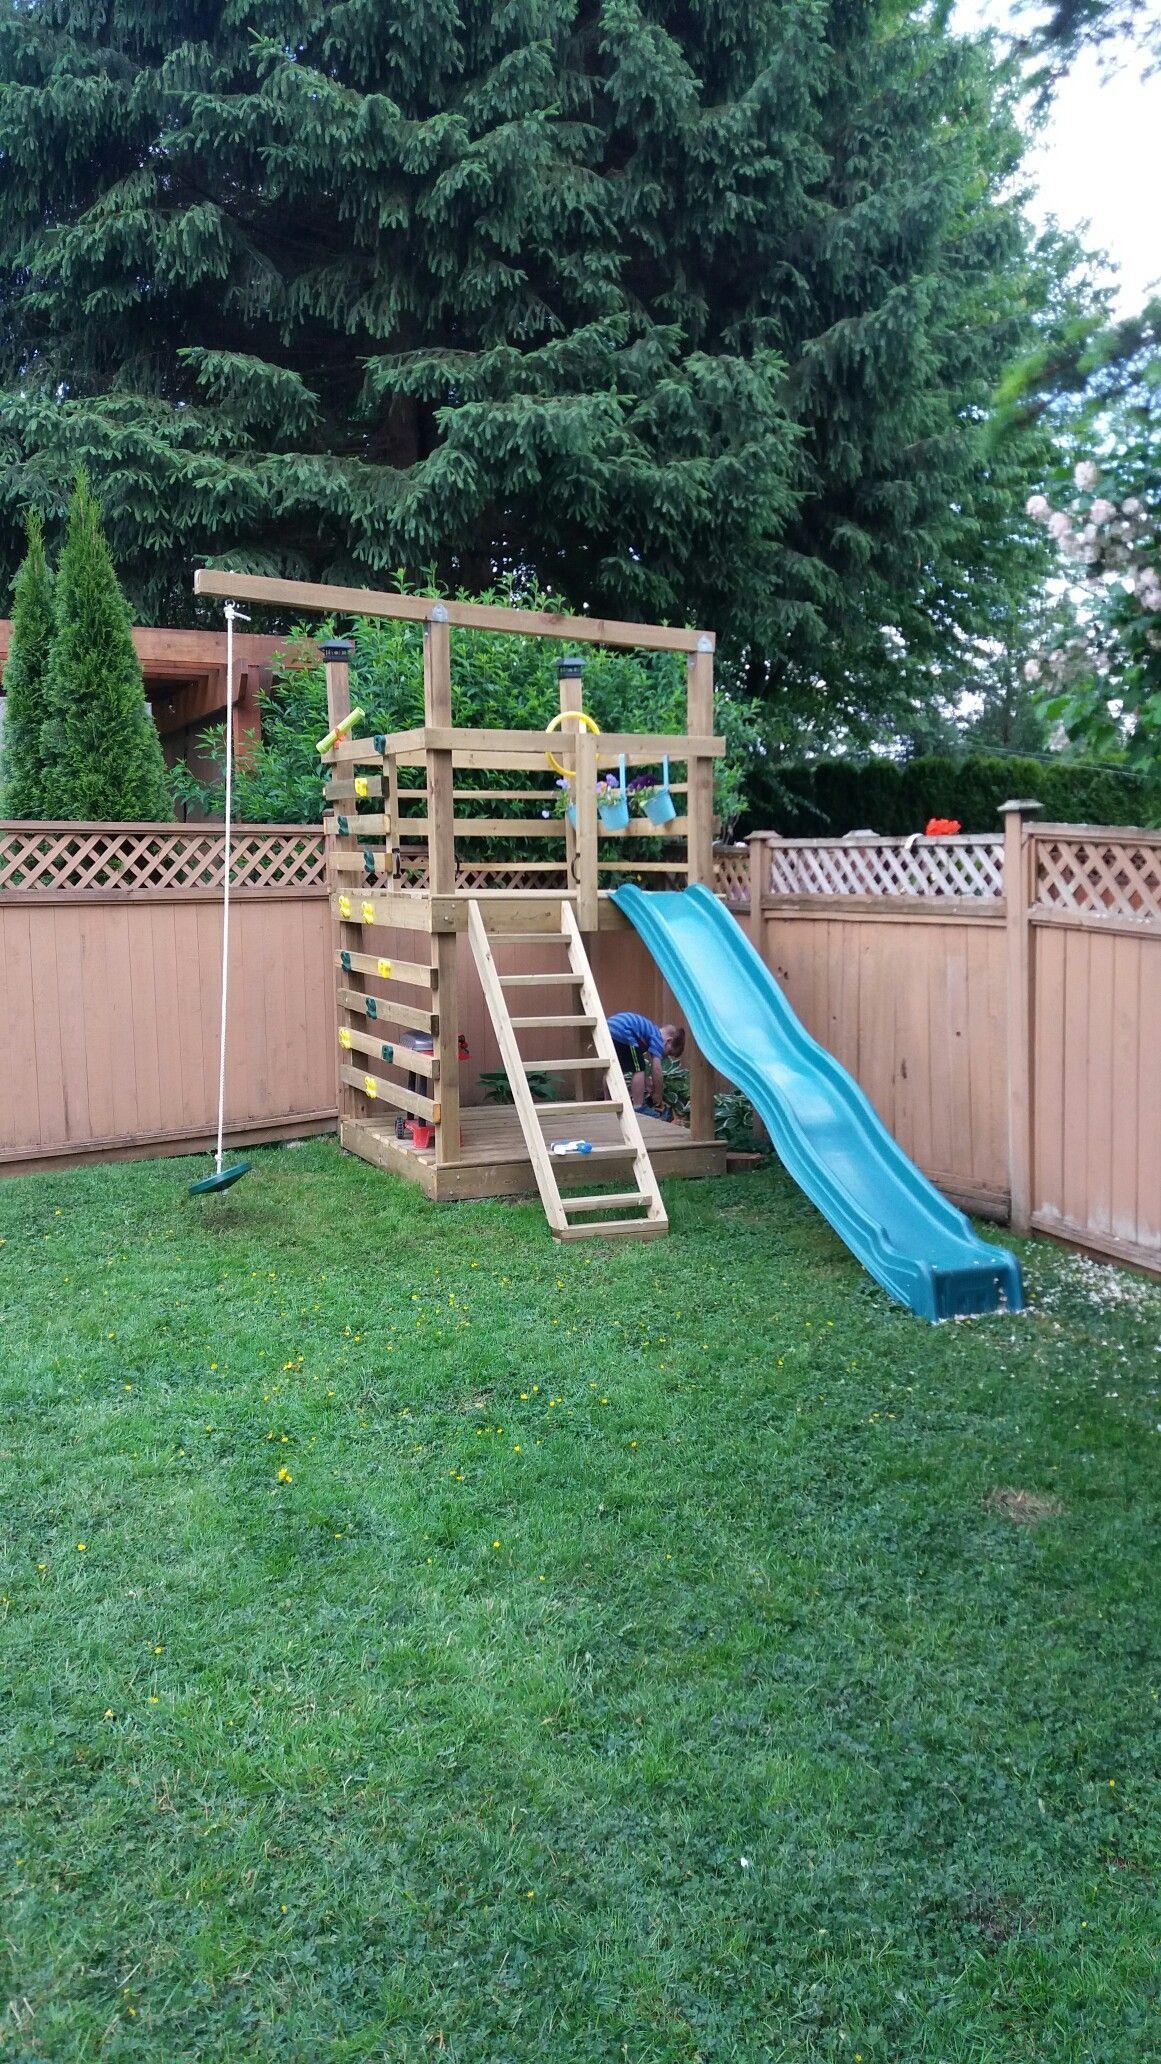 Diy Spiel Struktur In 2020 Play Area Backyard Backyard Kids Play Area Backyard Play